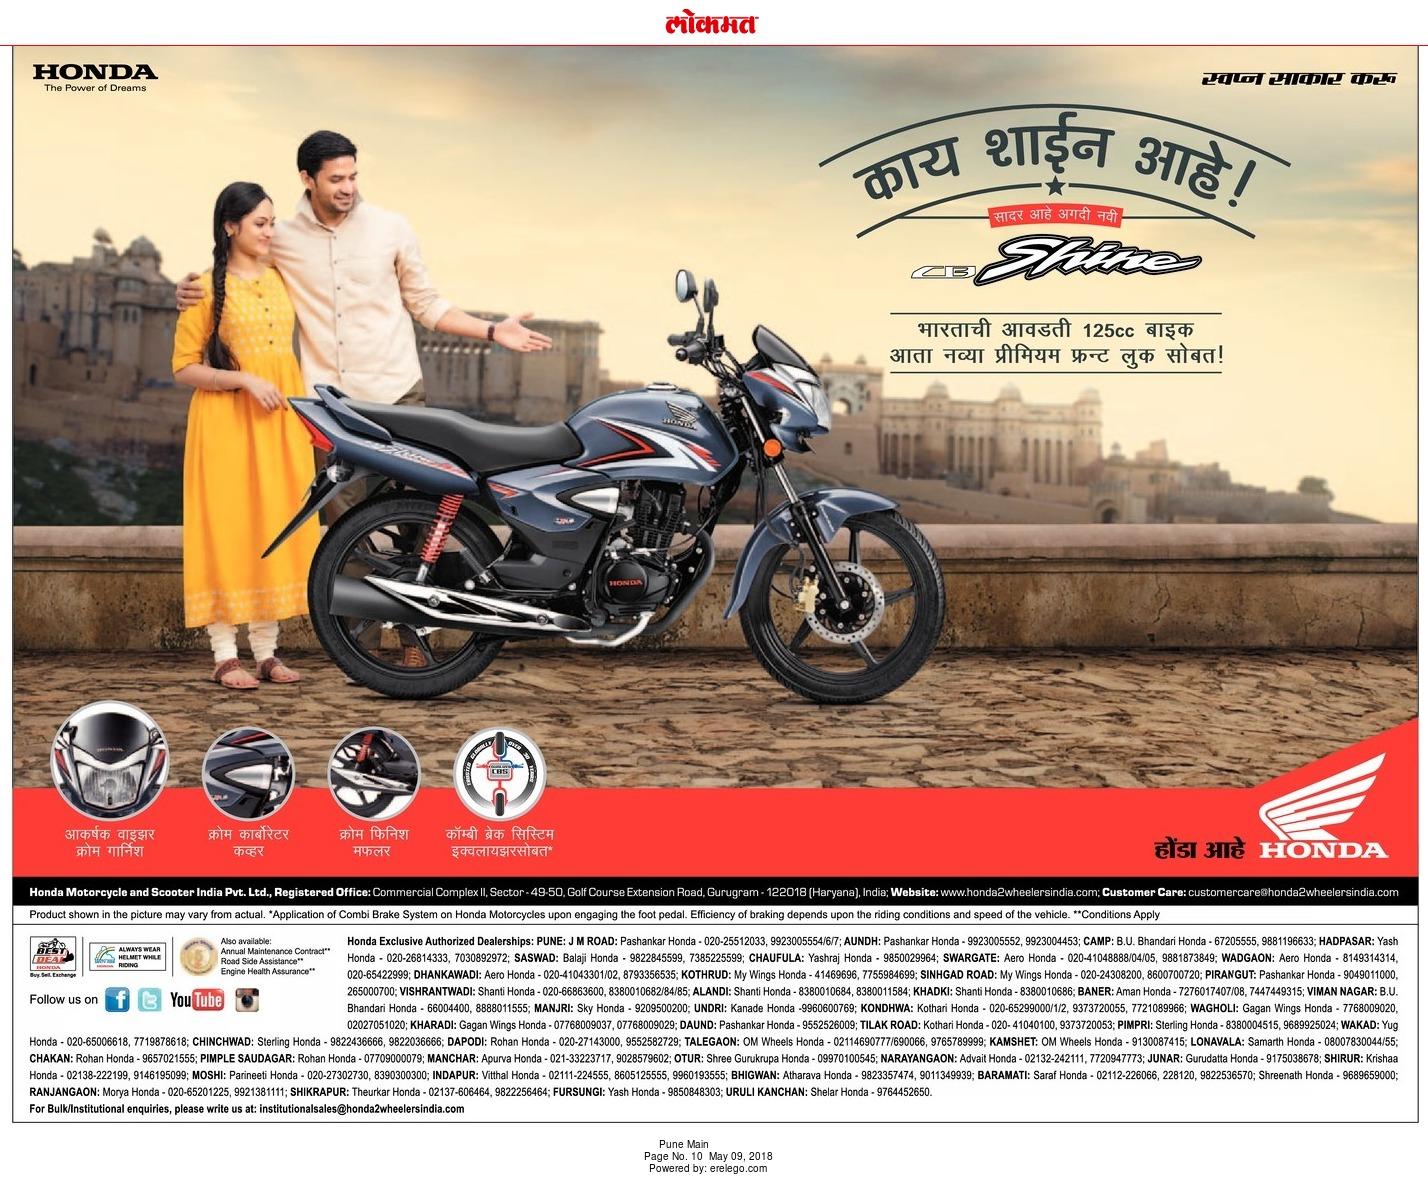 Honda Cb Shine Kaai Nayi Shine Aaye 125Cc Bike Ad